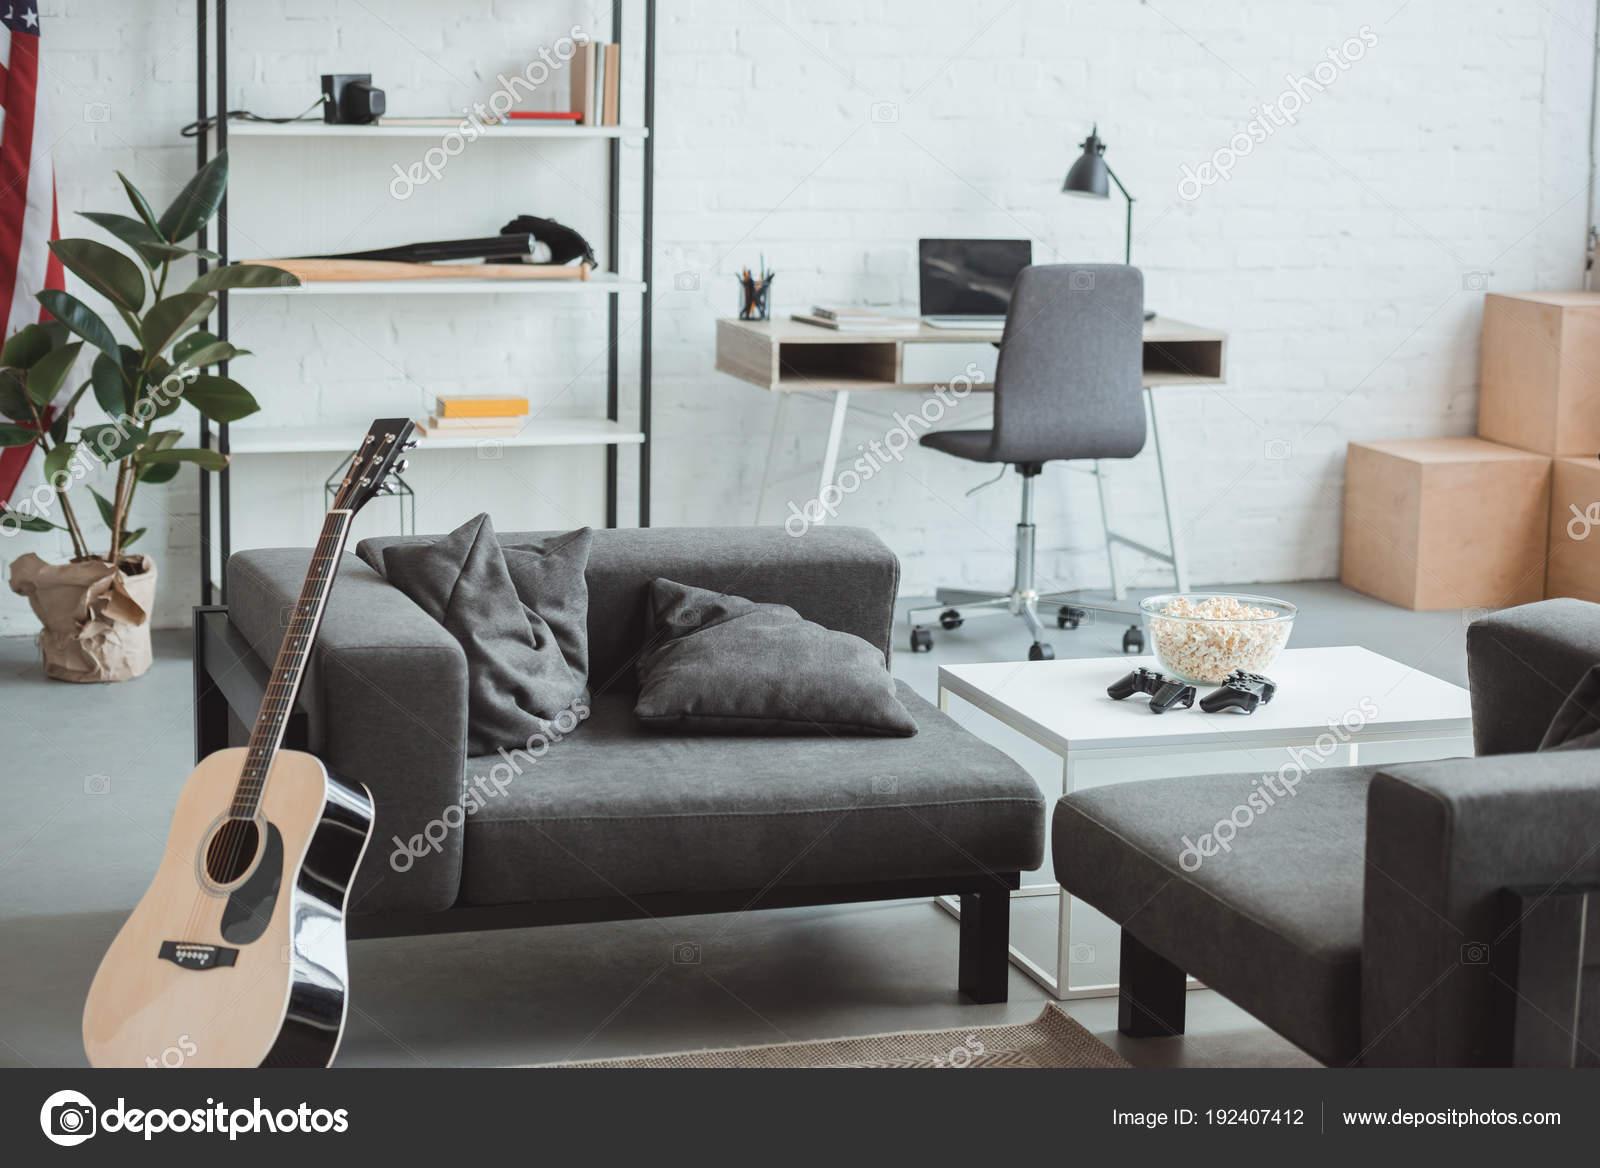 Wondrous Interior Modern Living Room Armchairs Guitar Shelves Tables Theyellowbook Wood Chair Design Ideas Theyellowbookinfo